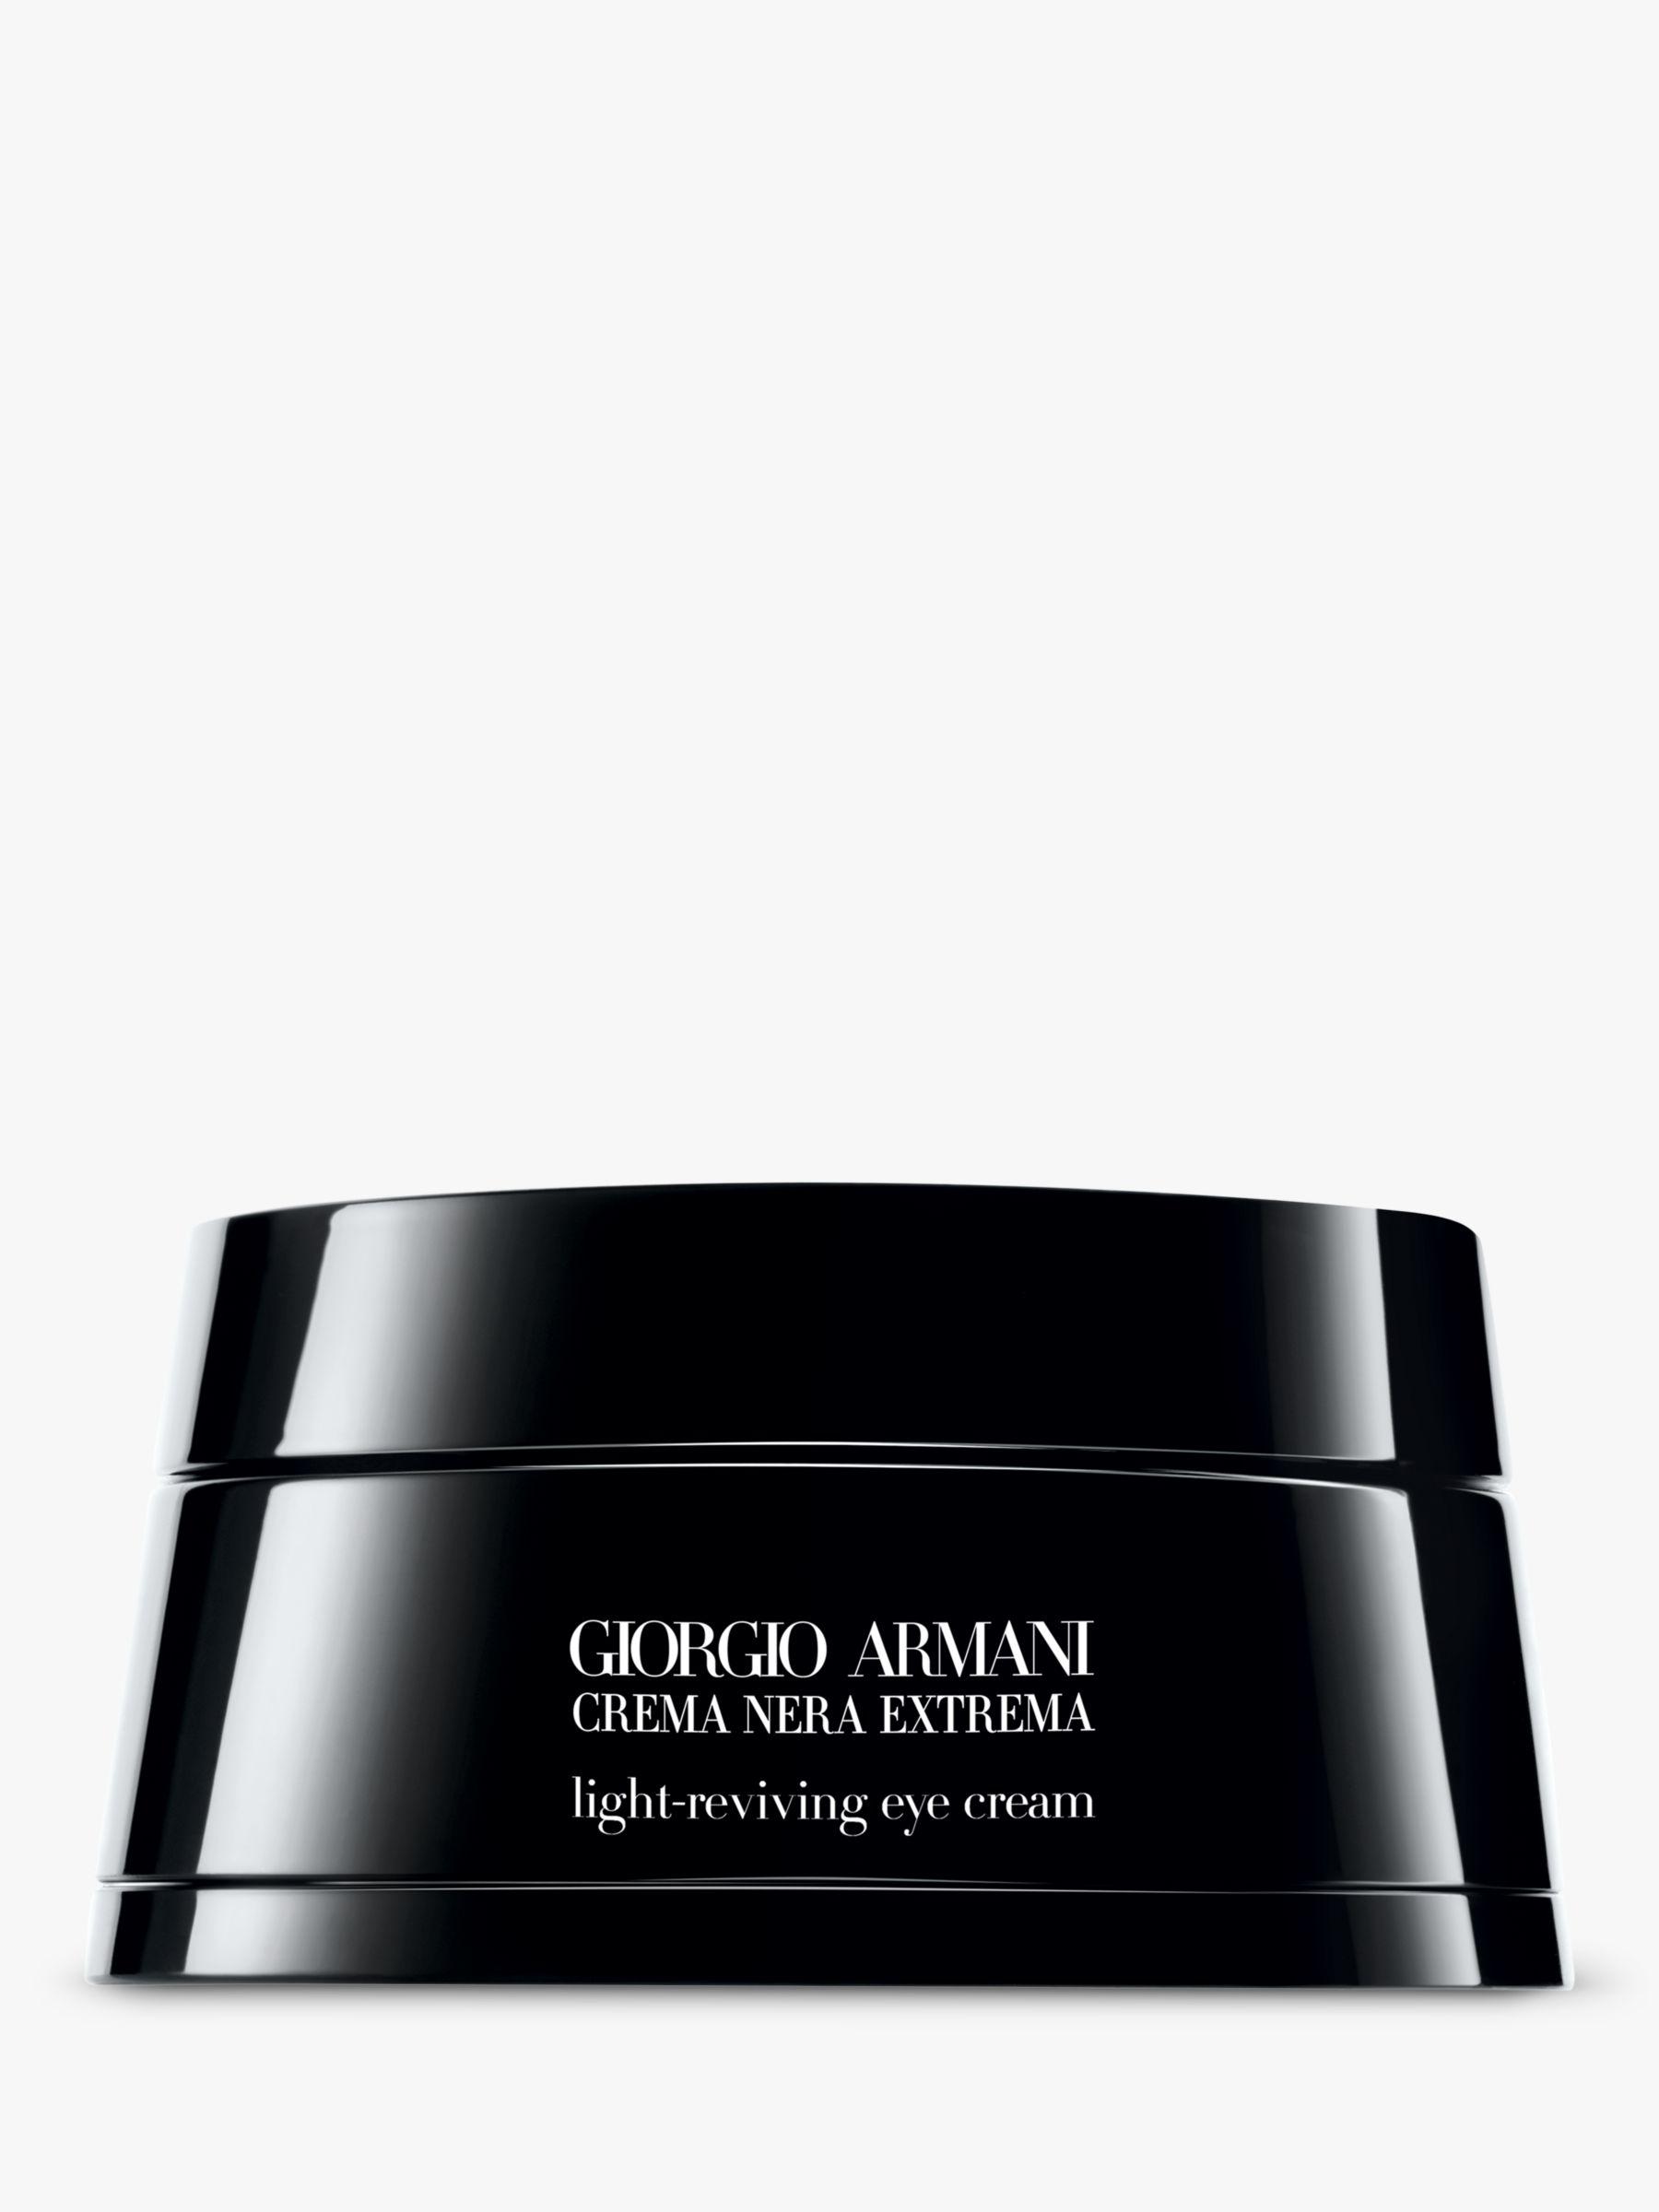 Giorgio Armani Giorgio Armani Crema Nera Extrema Eye Cream, 15g